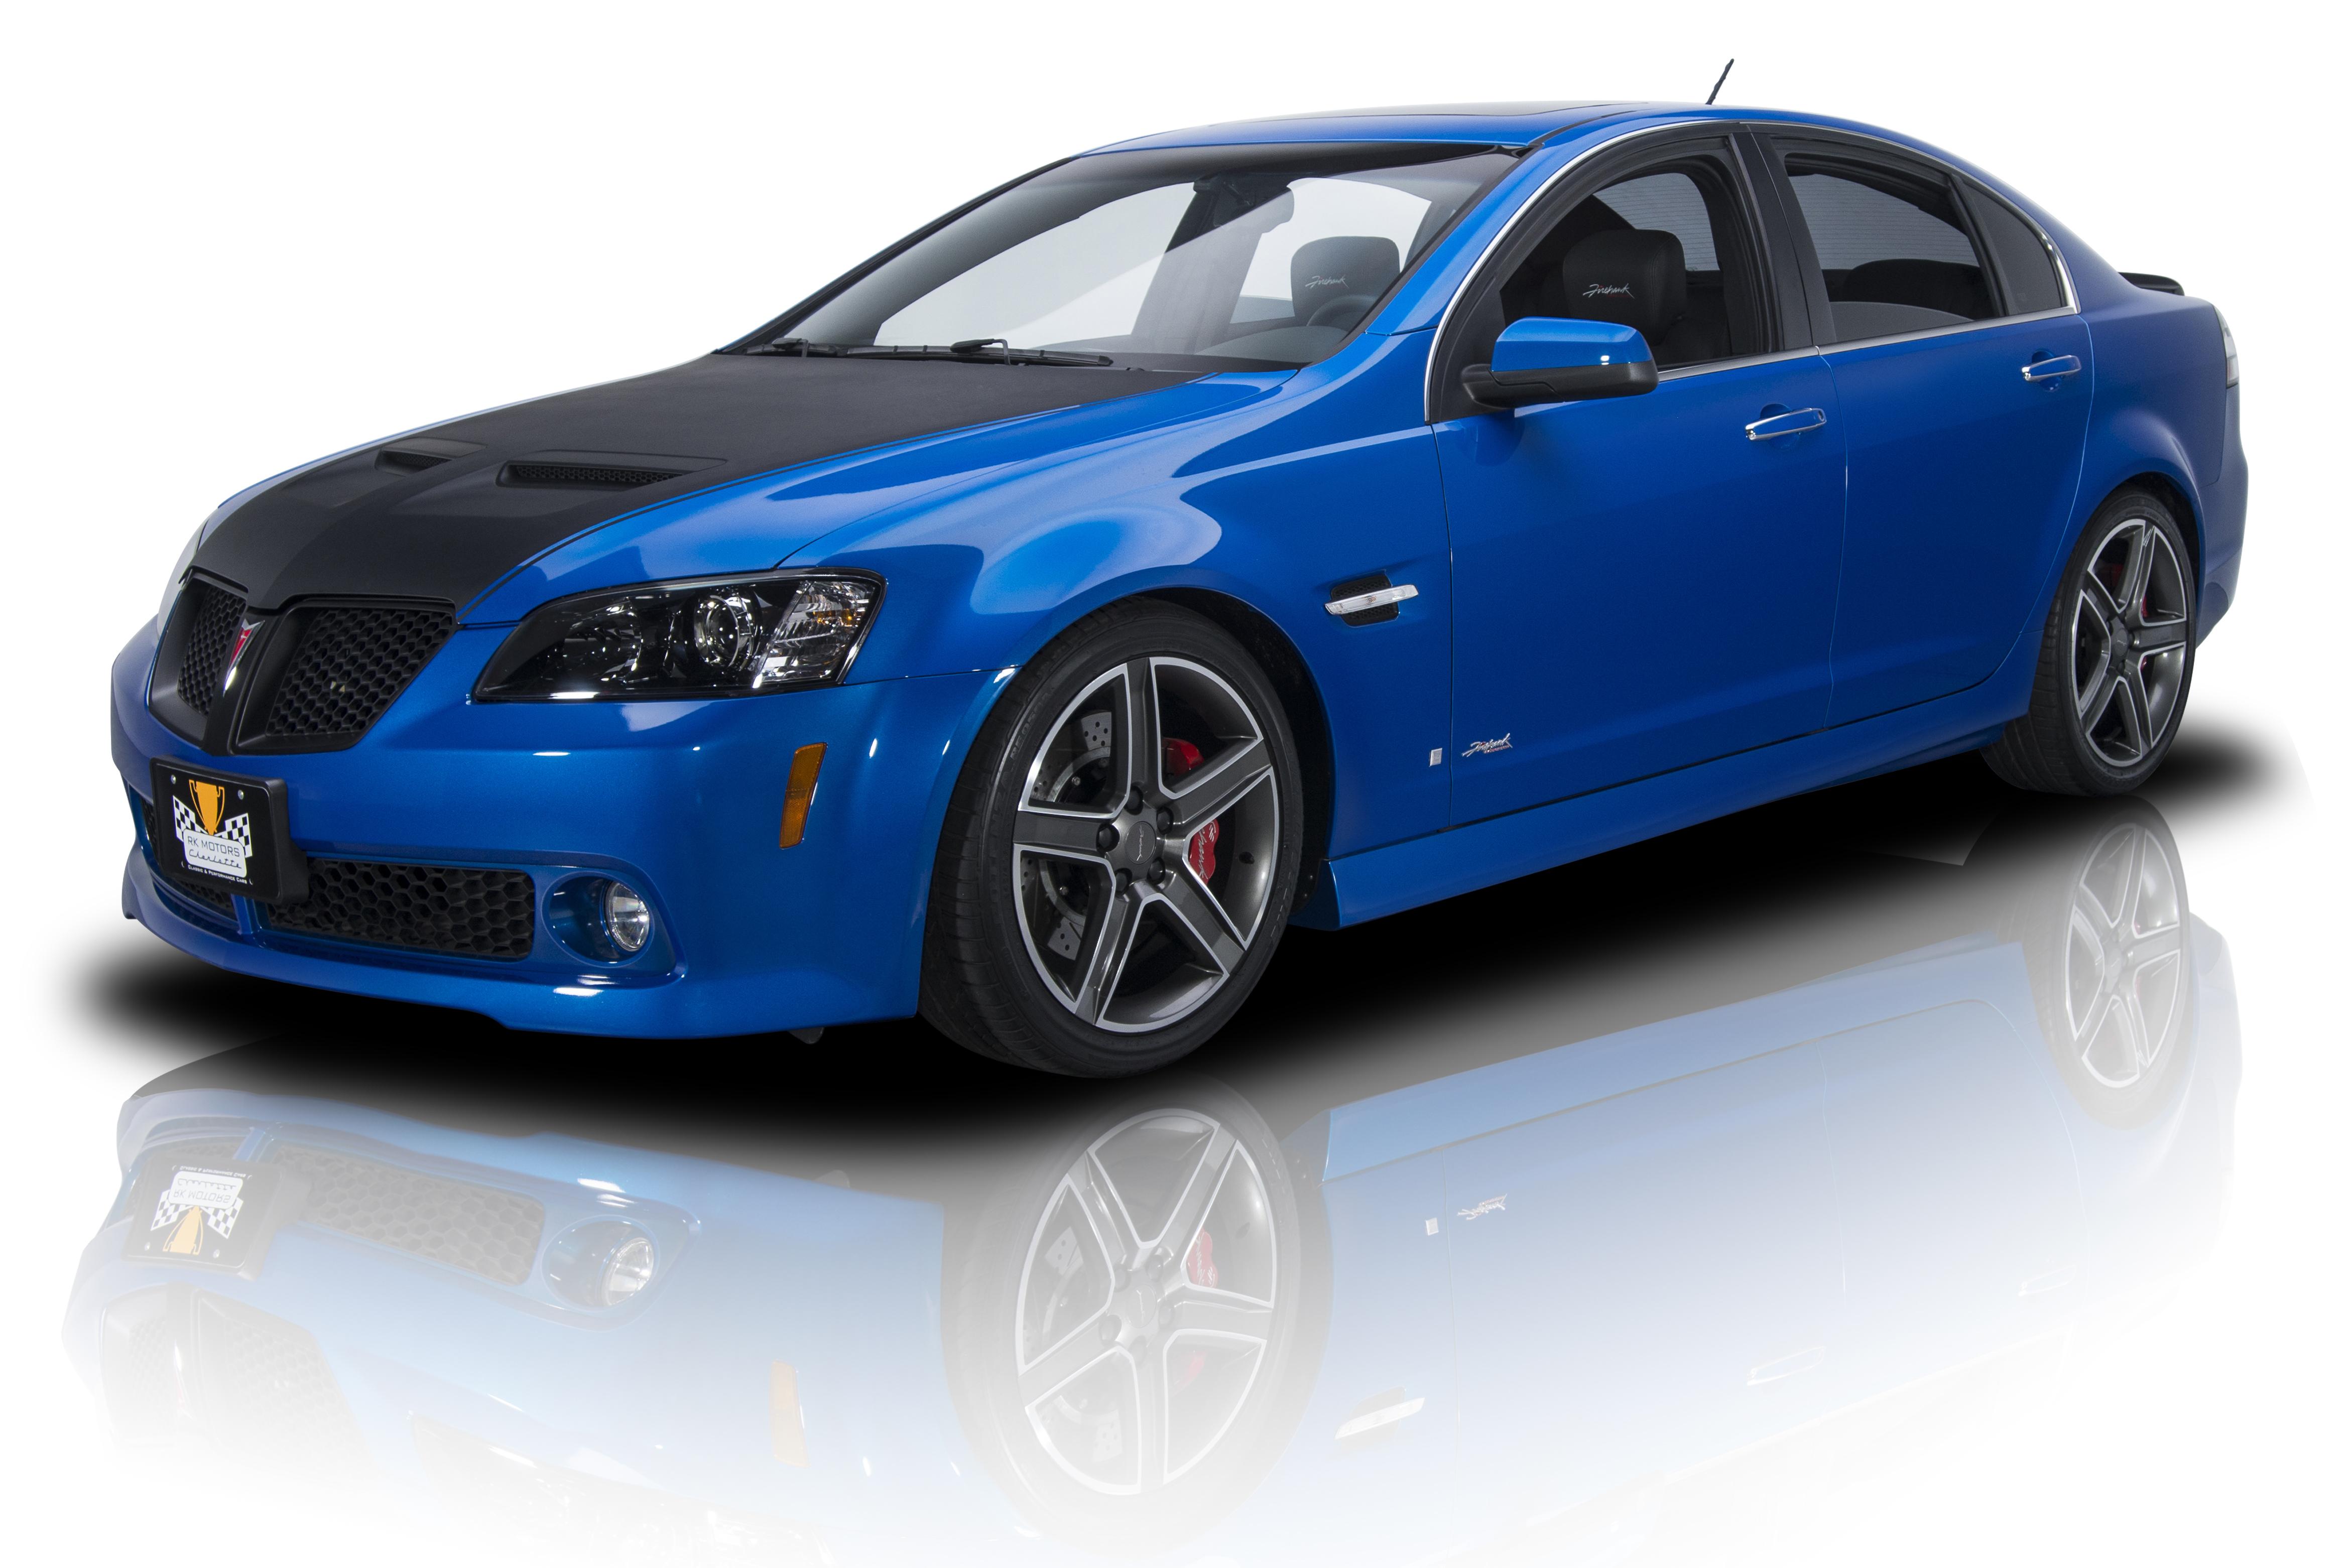 135810 2009 pontiac g8 rk motors classic and performance cars for sale. Black Bedroom Furniture Sets. Home Design Ideas